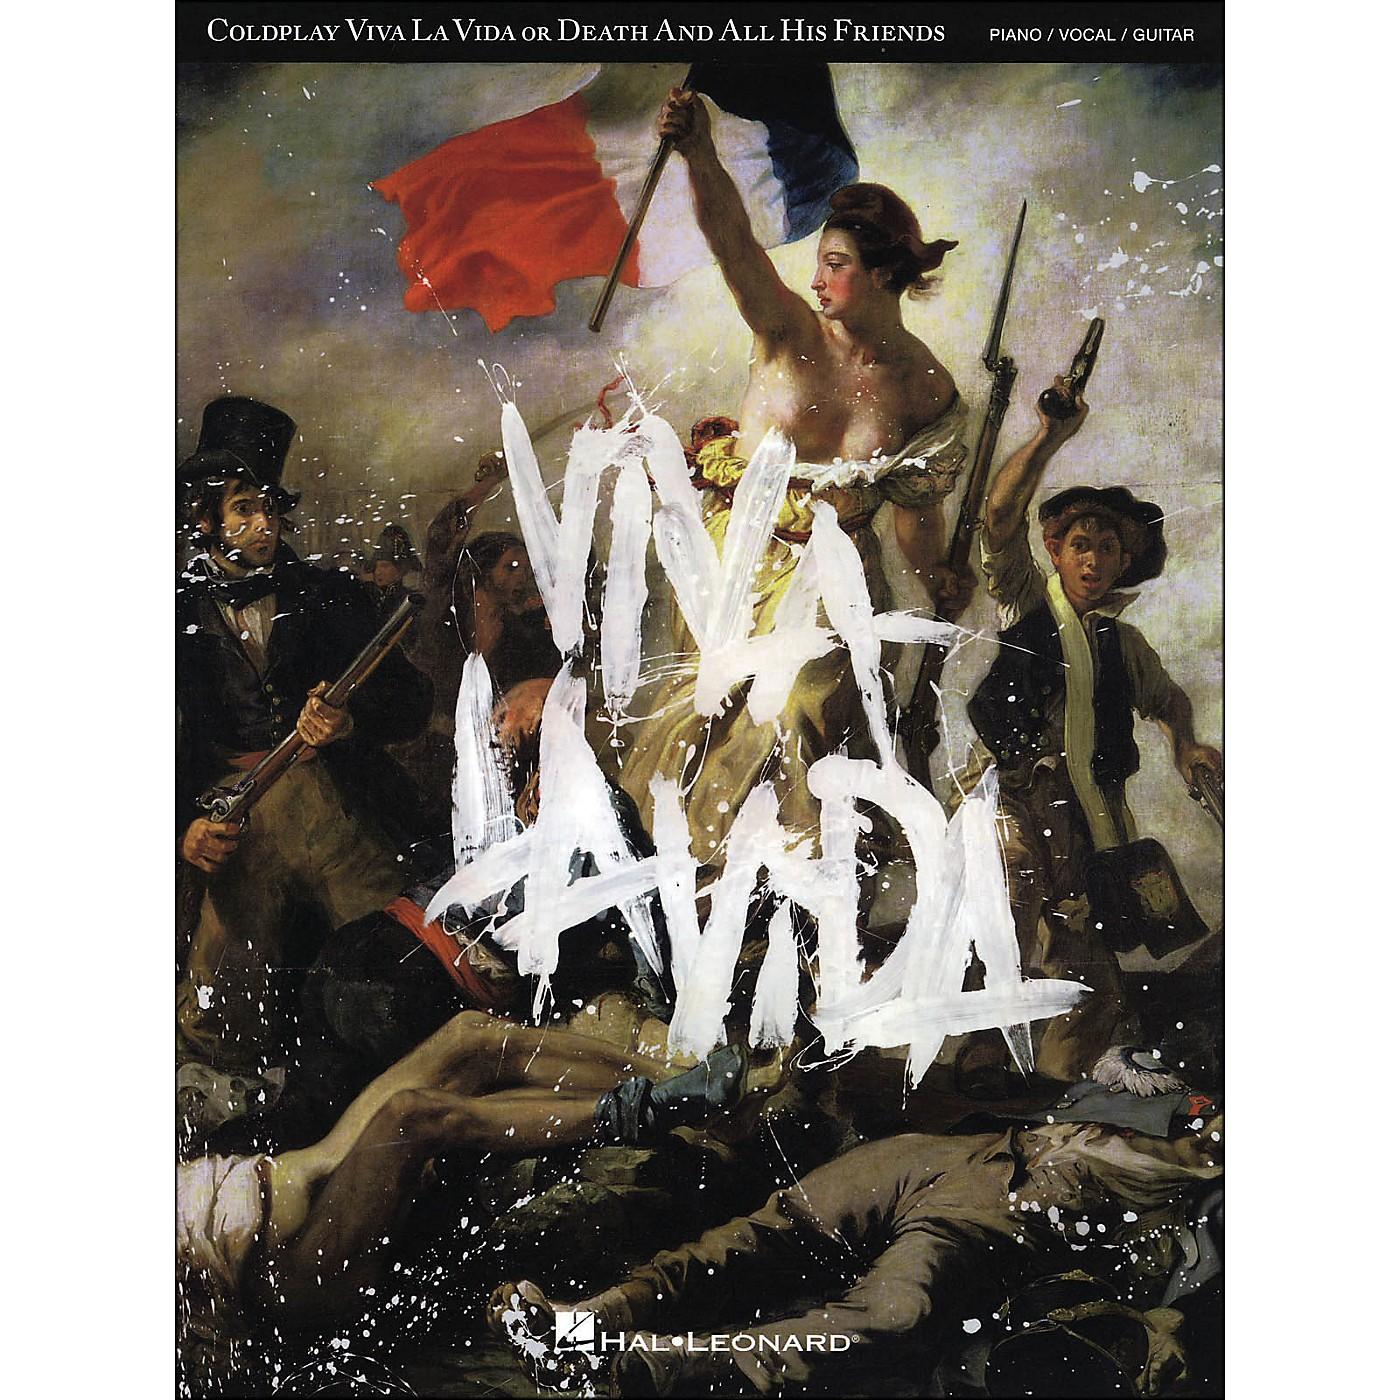 Hal Leonard Coldplay - Viva La Vida arranged for piano, vocal, and guitar (P/V/G) thumbnail